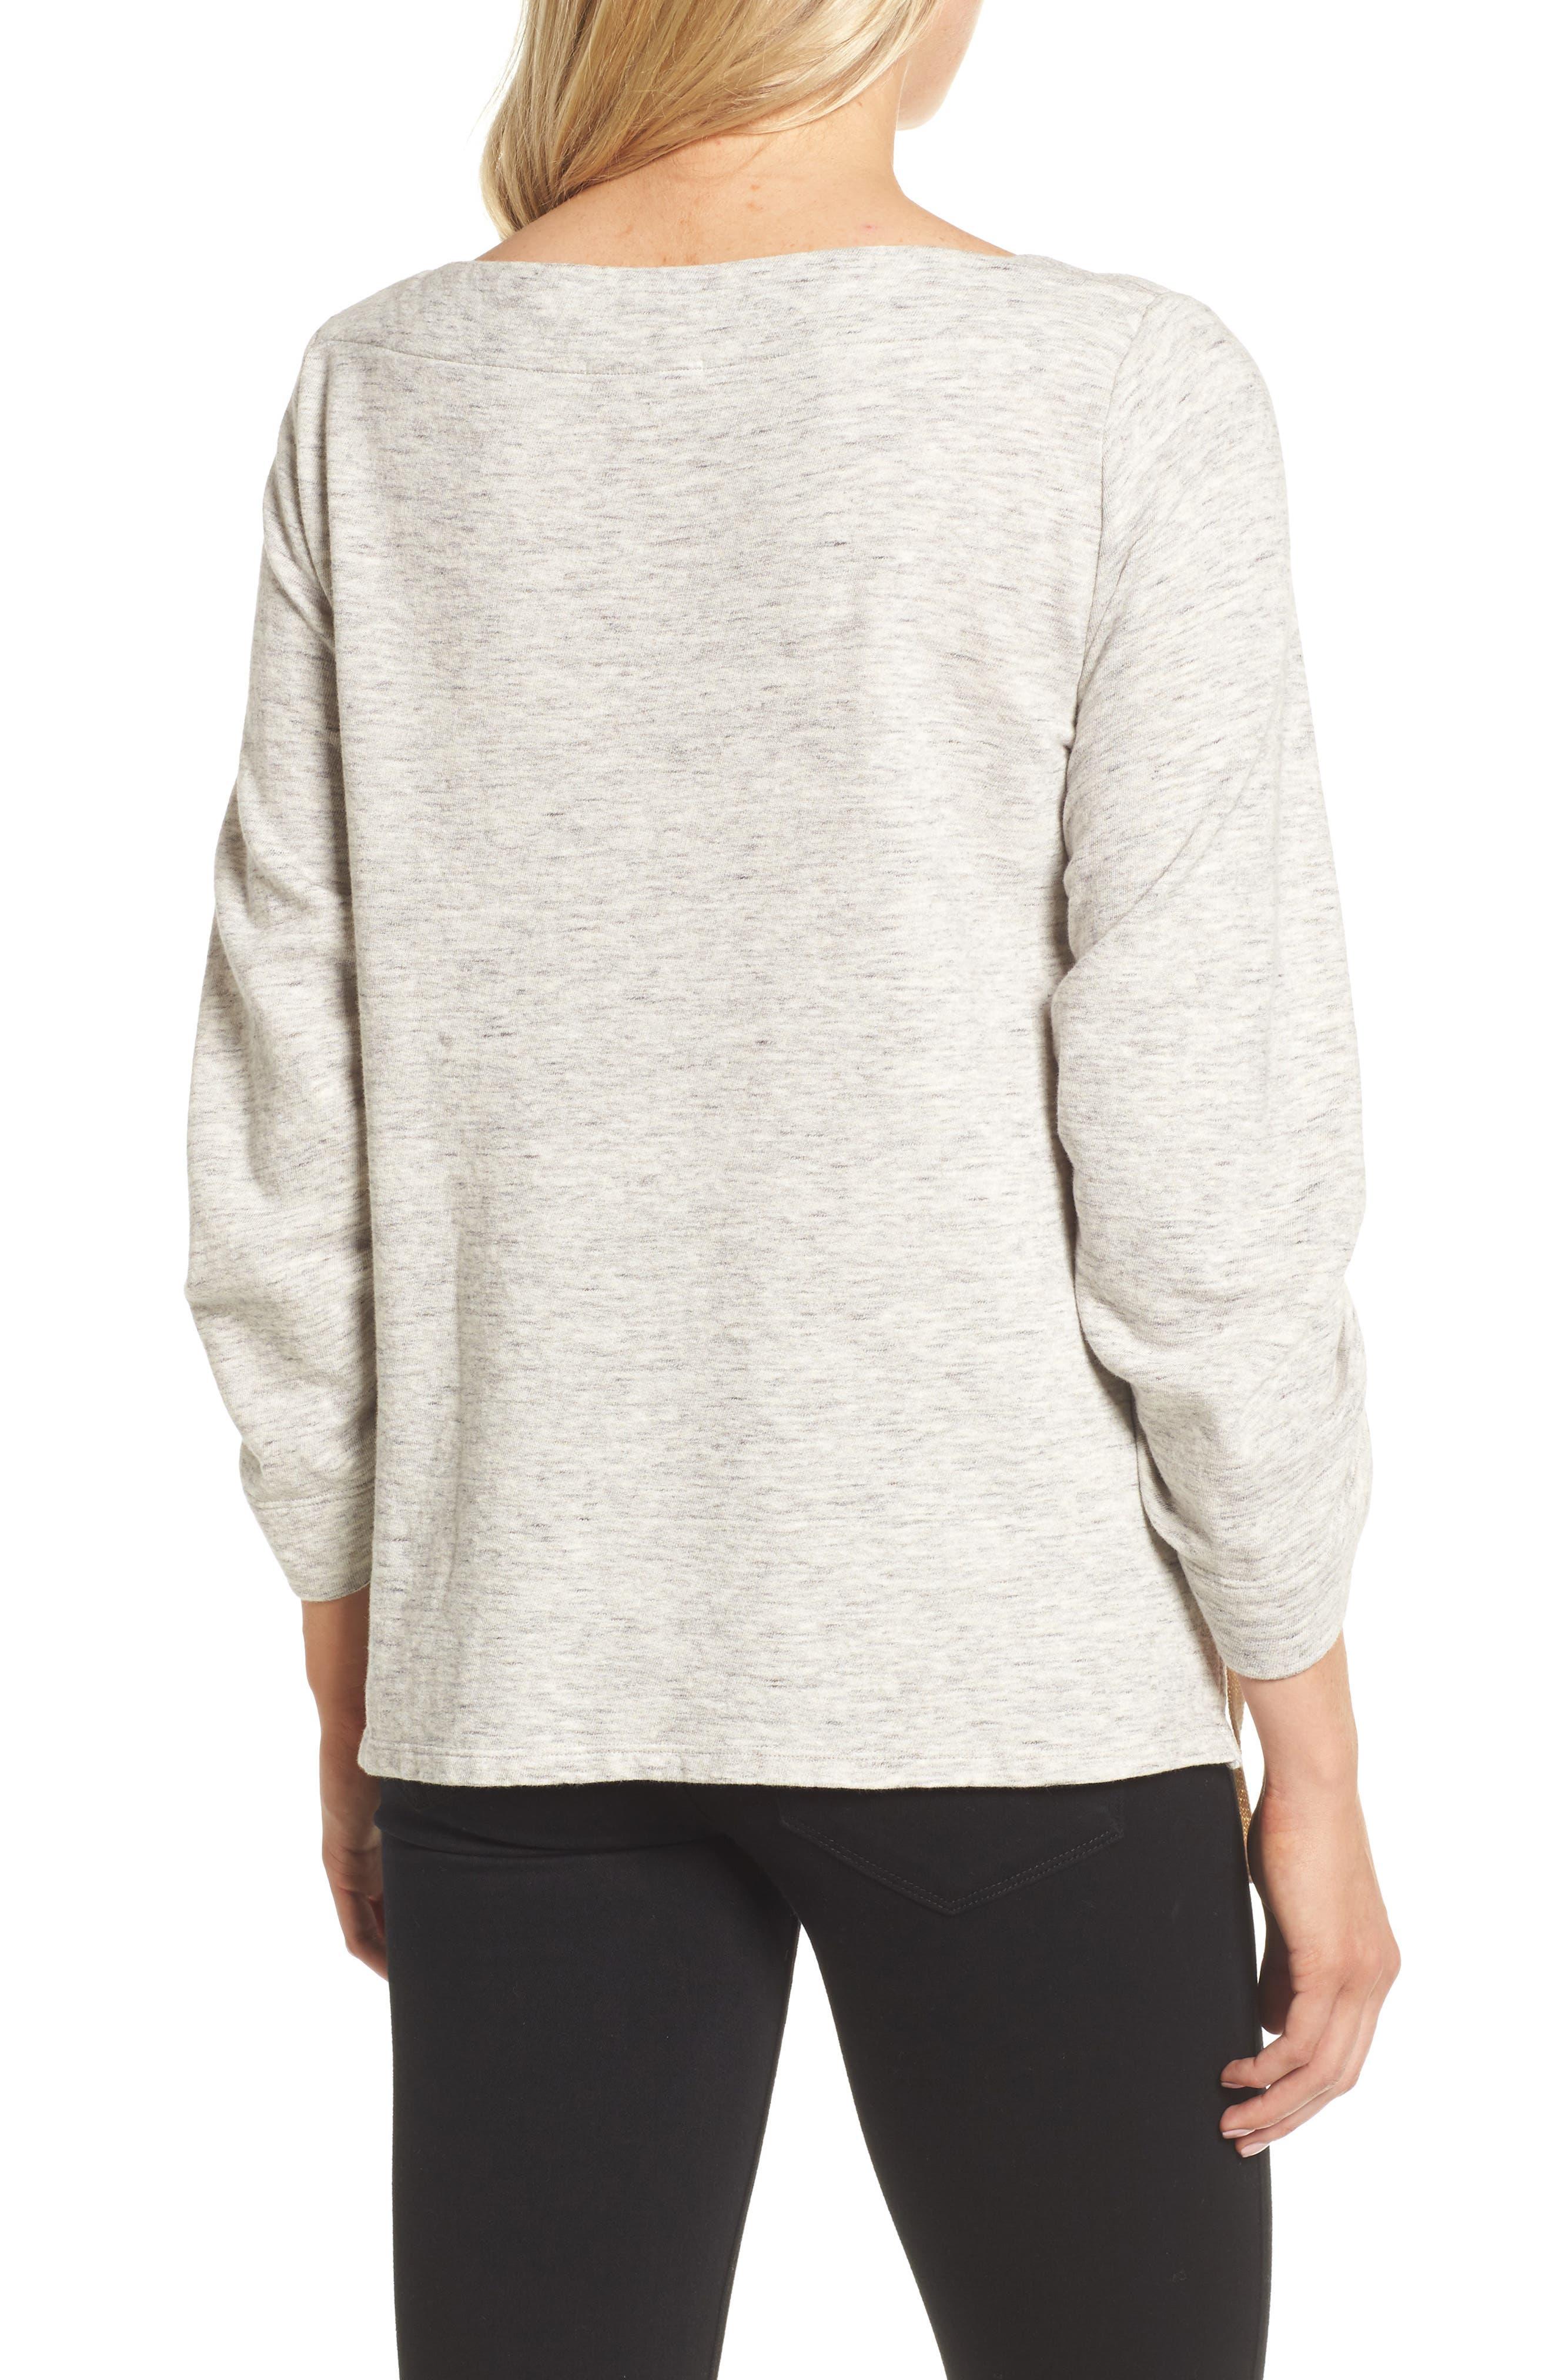 Ruched Sleeve Sweatshirt,                             Alternate thumbnail 2, color,